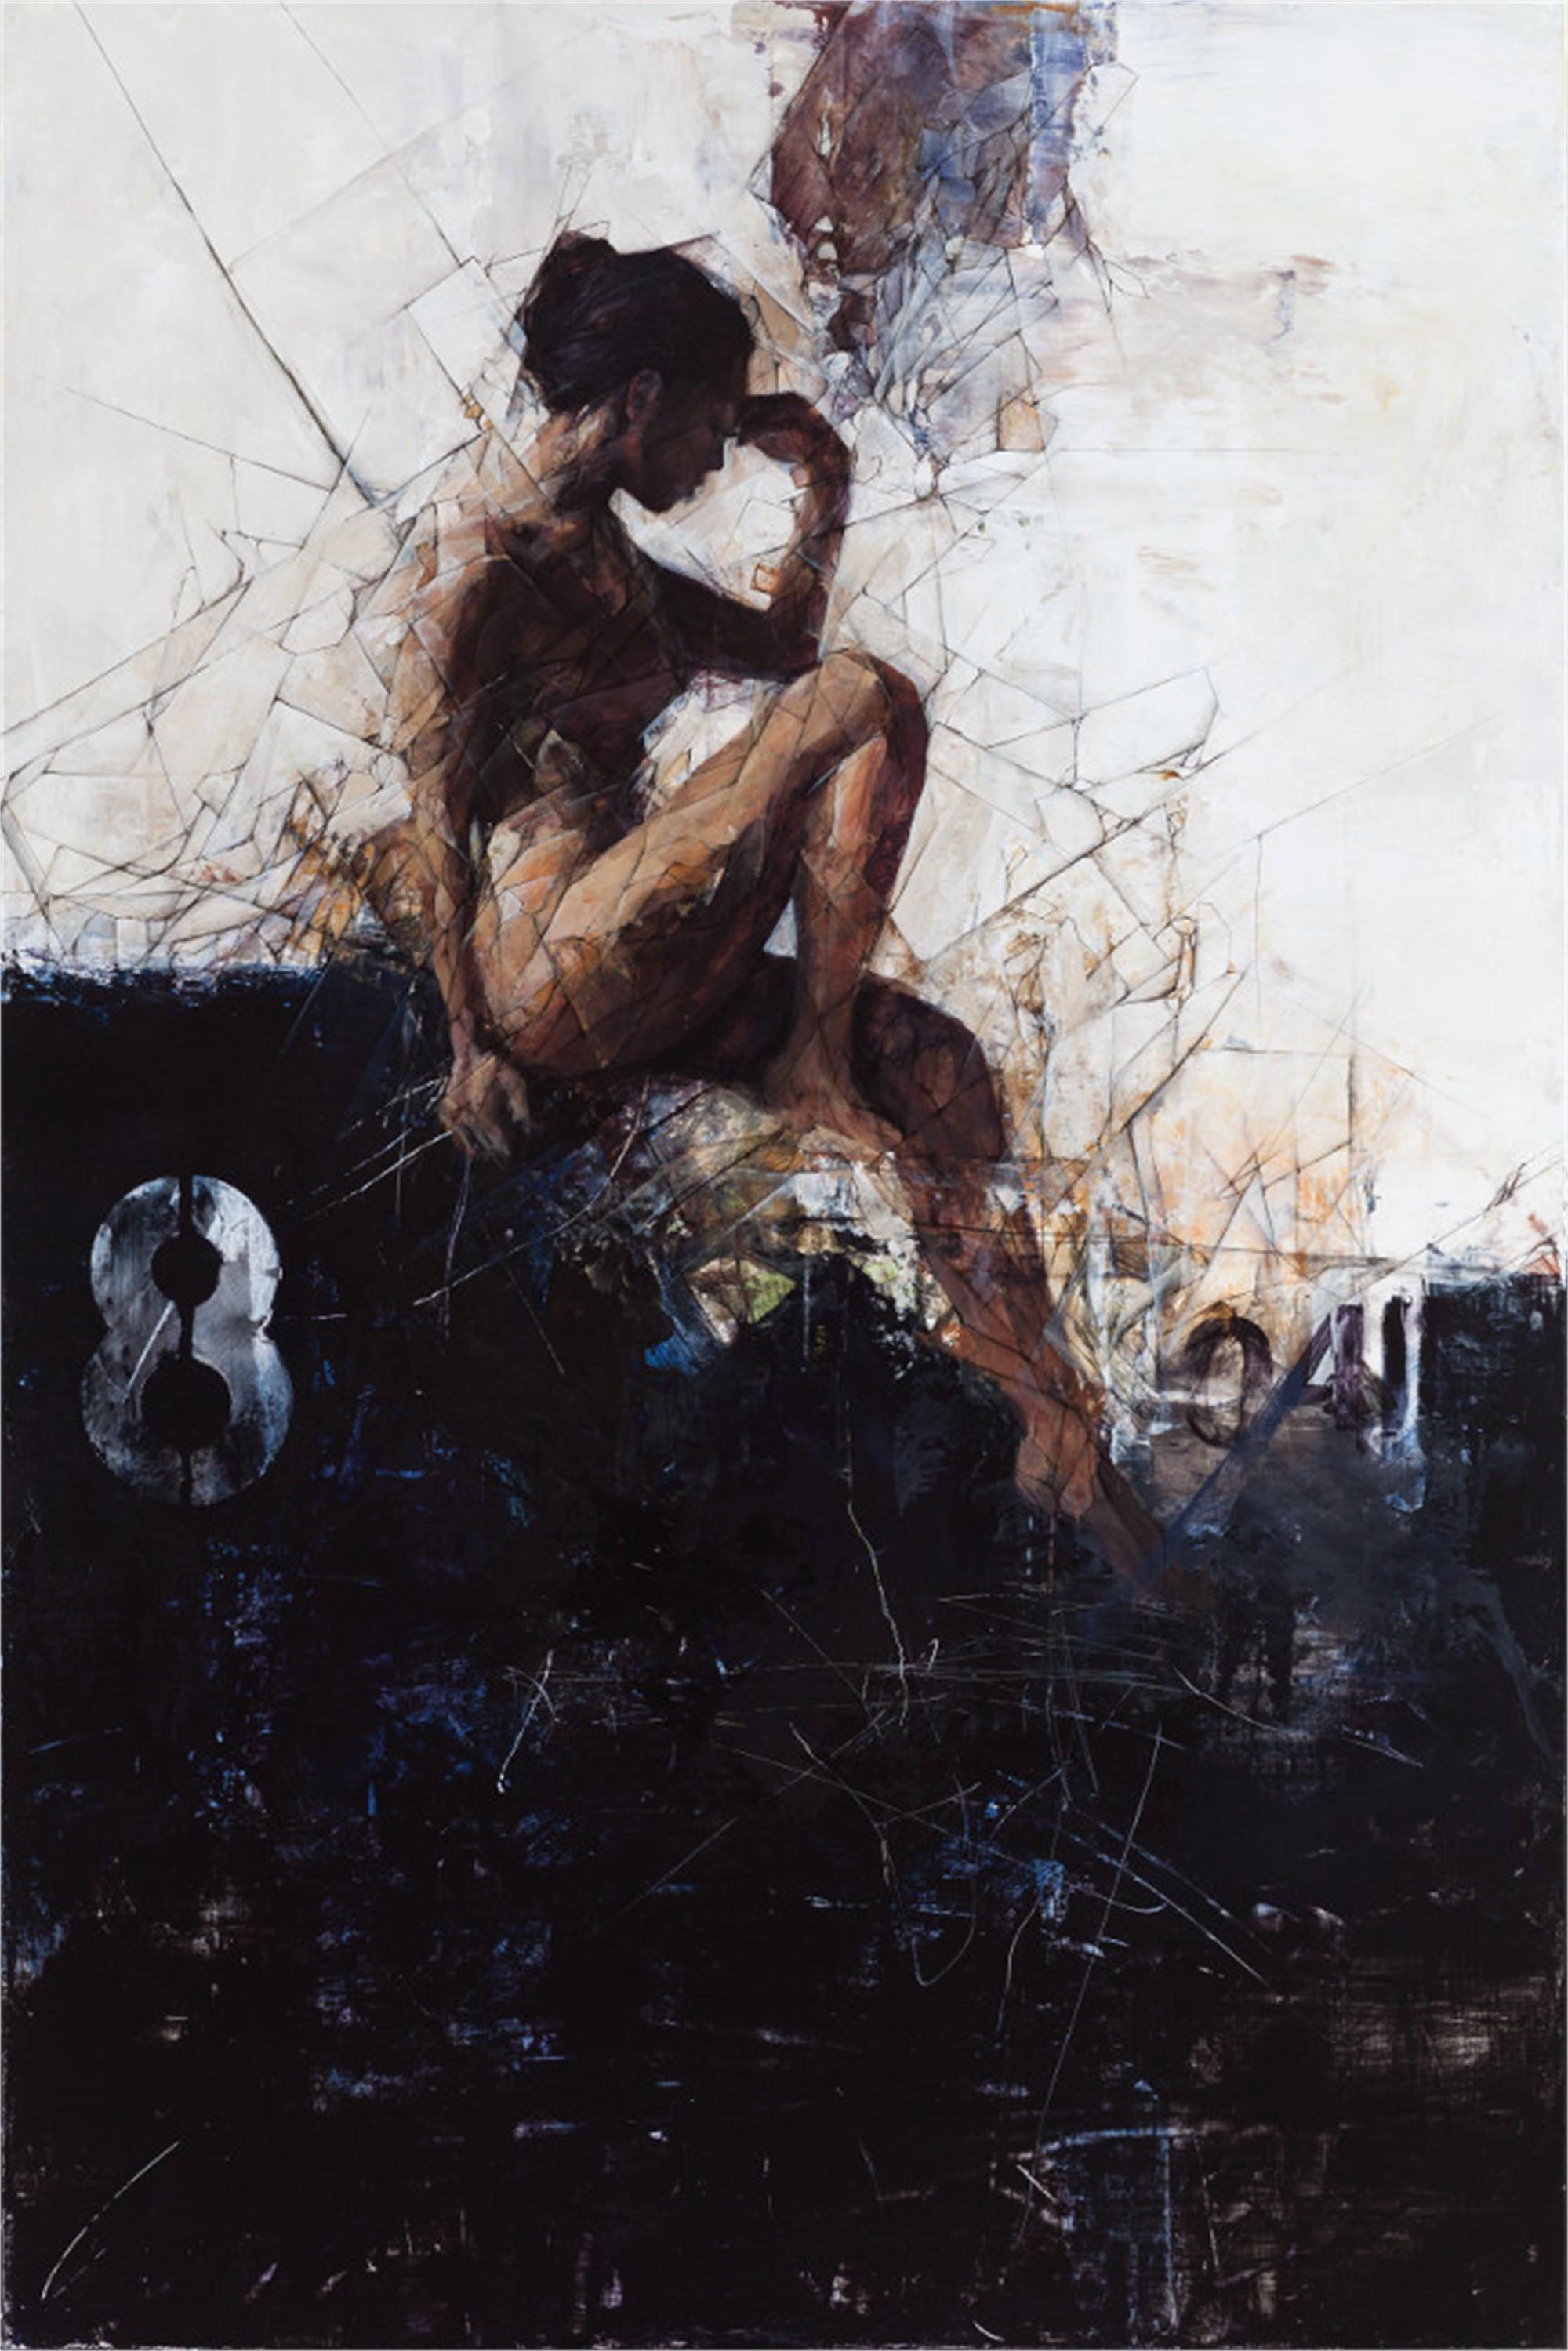 Solace by Aiden Kringen